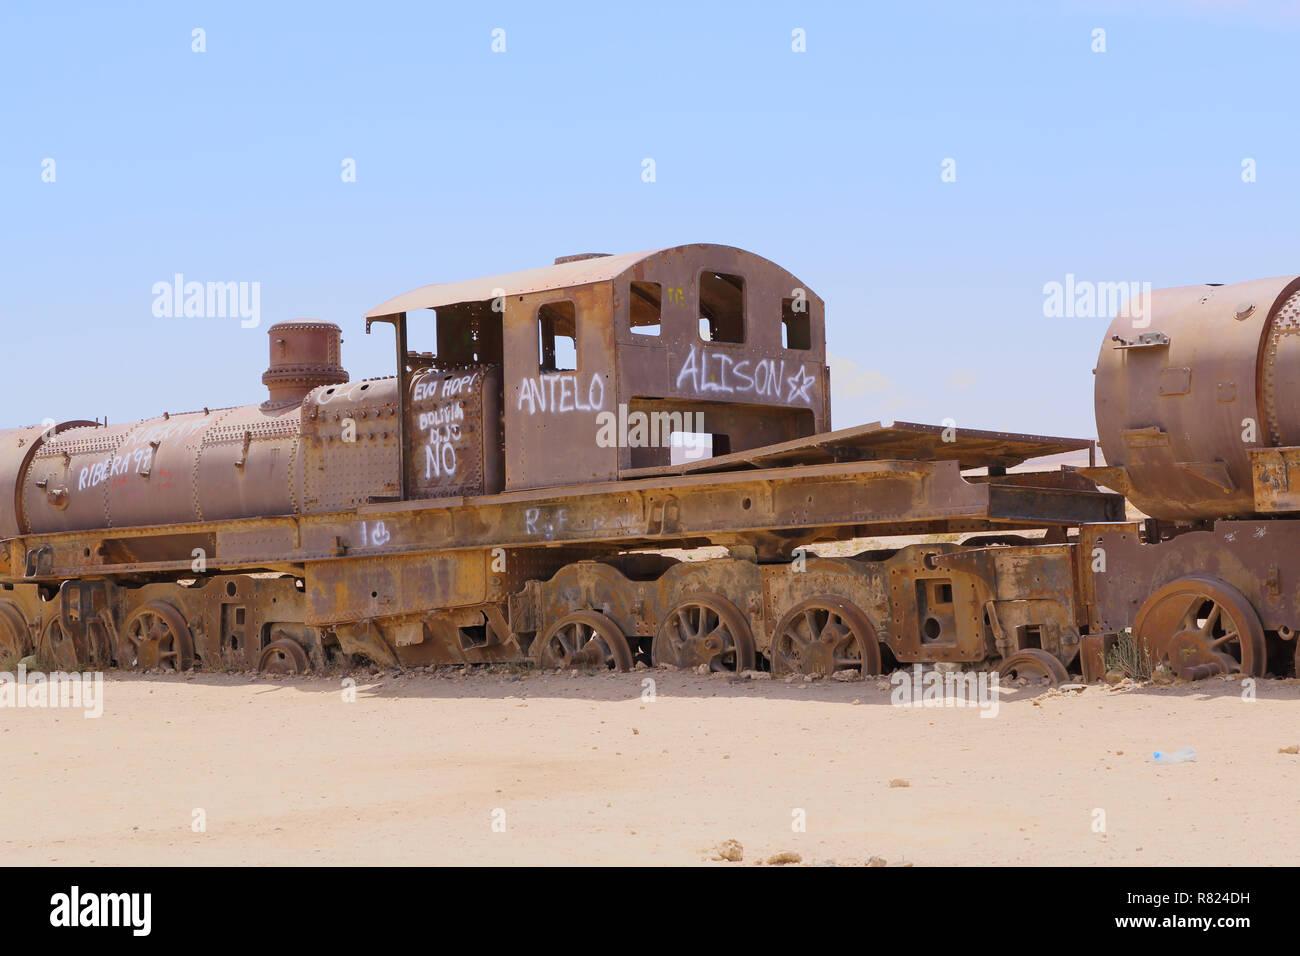 Uyuni, Bolivia. Rusty old steam locomotive. train cemetery on Bolivian altiplano. Stock Photo